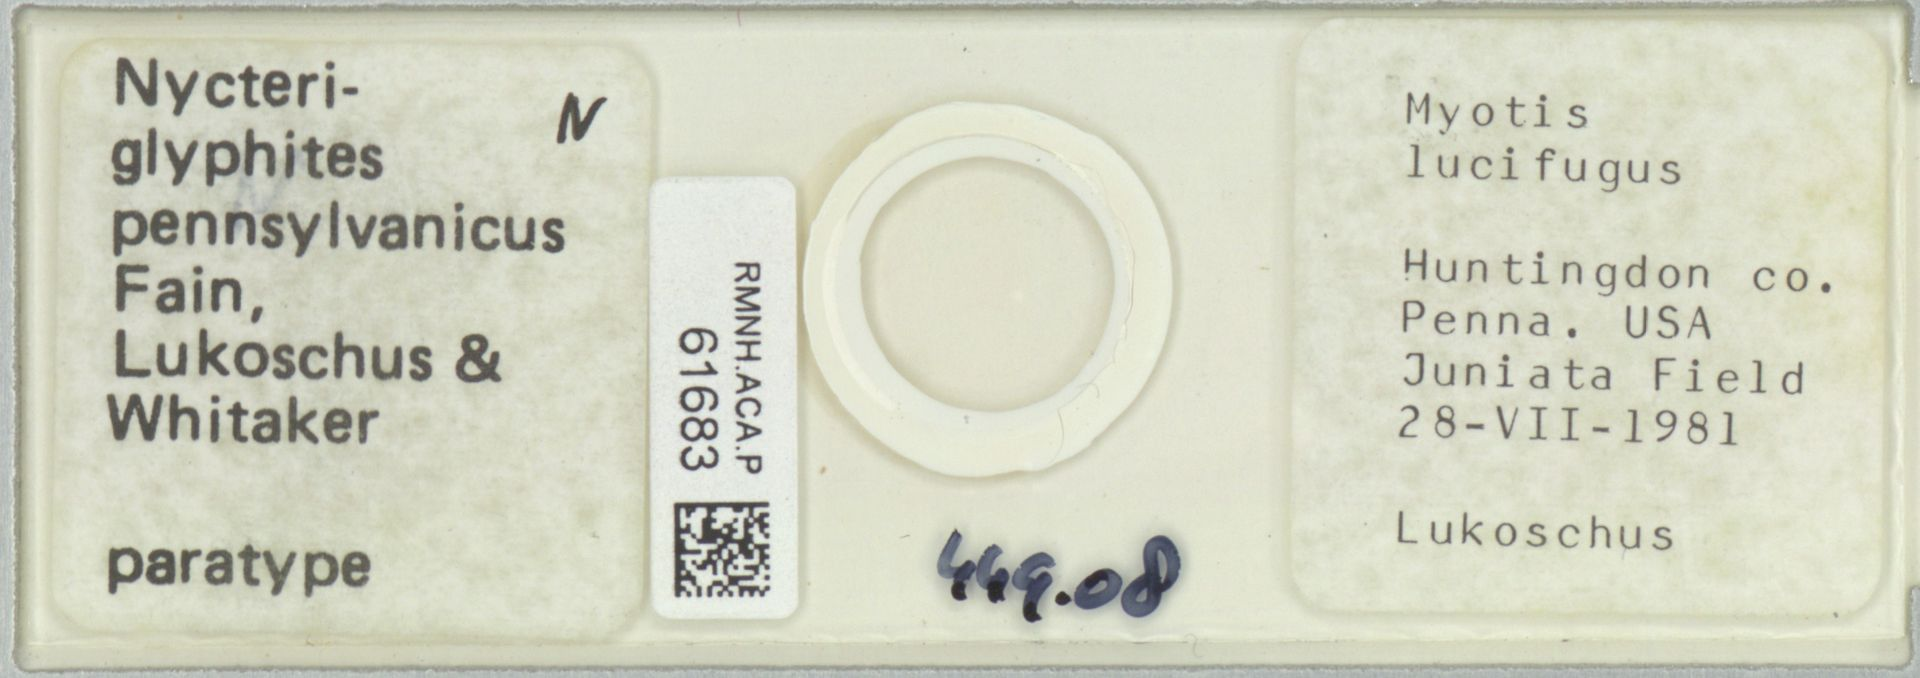 RMNH.ACA.P.61683 | Nycteriglyphites pennsylvanicus Fain, Lukoschus & Whitaker